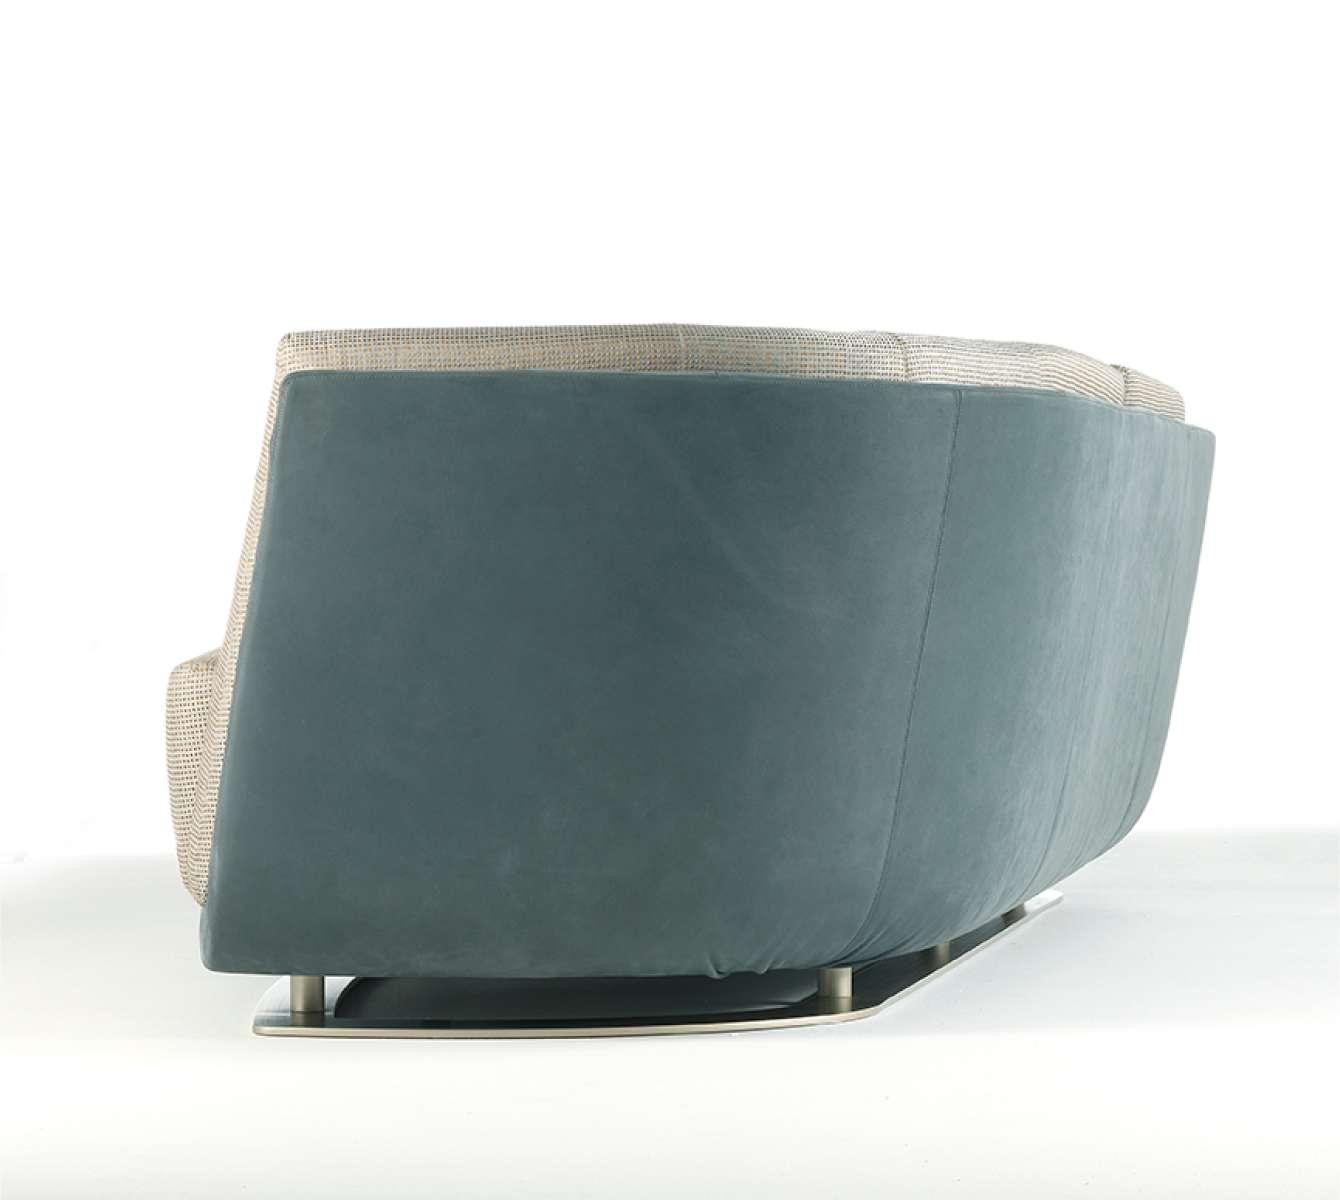 Studio Marco Piva – Product design – 411